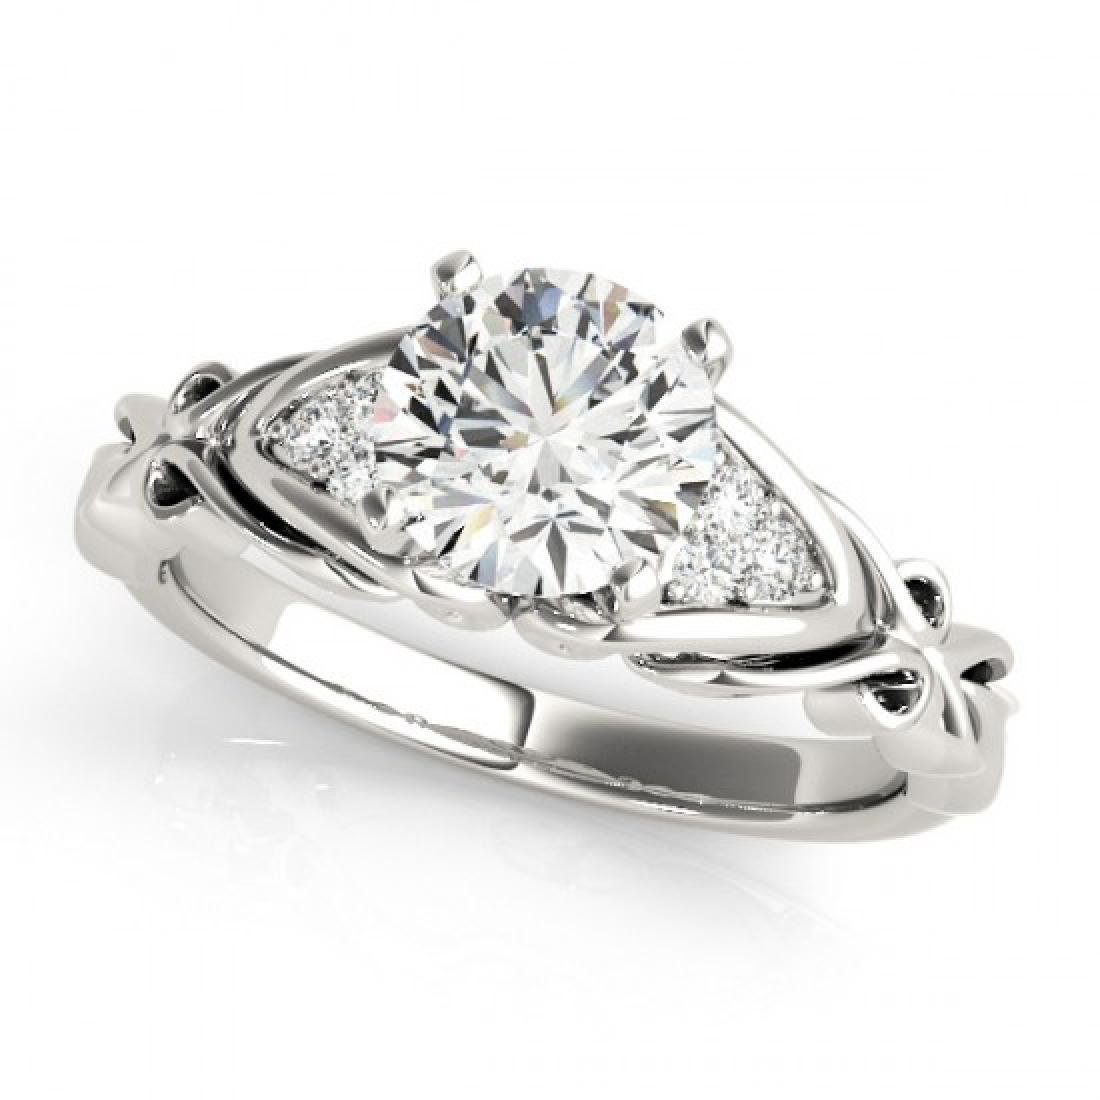 0.85 CTW VS/SI Diamond Solitaire Ring 18K White Gold